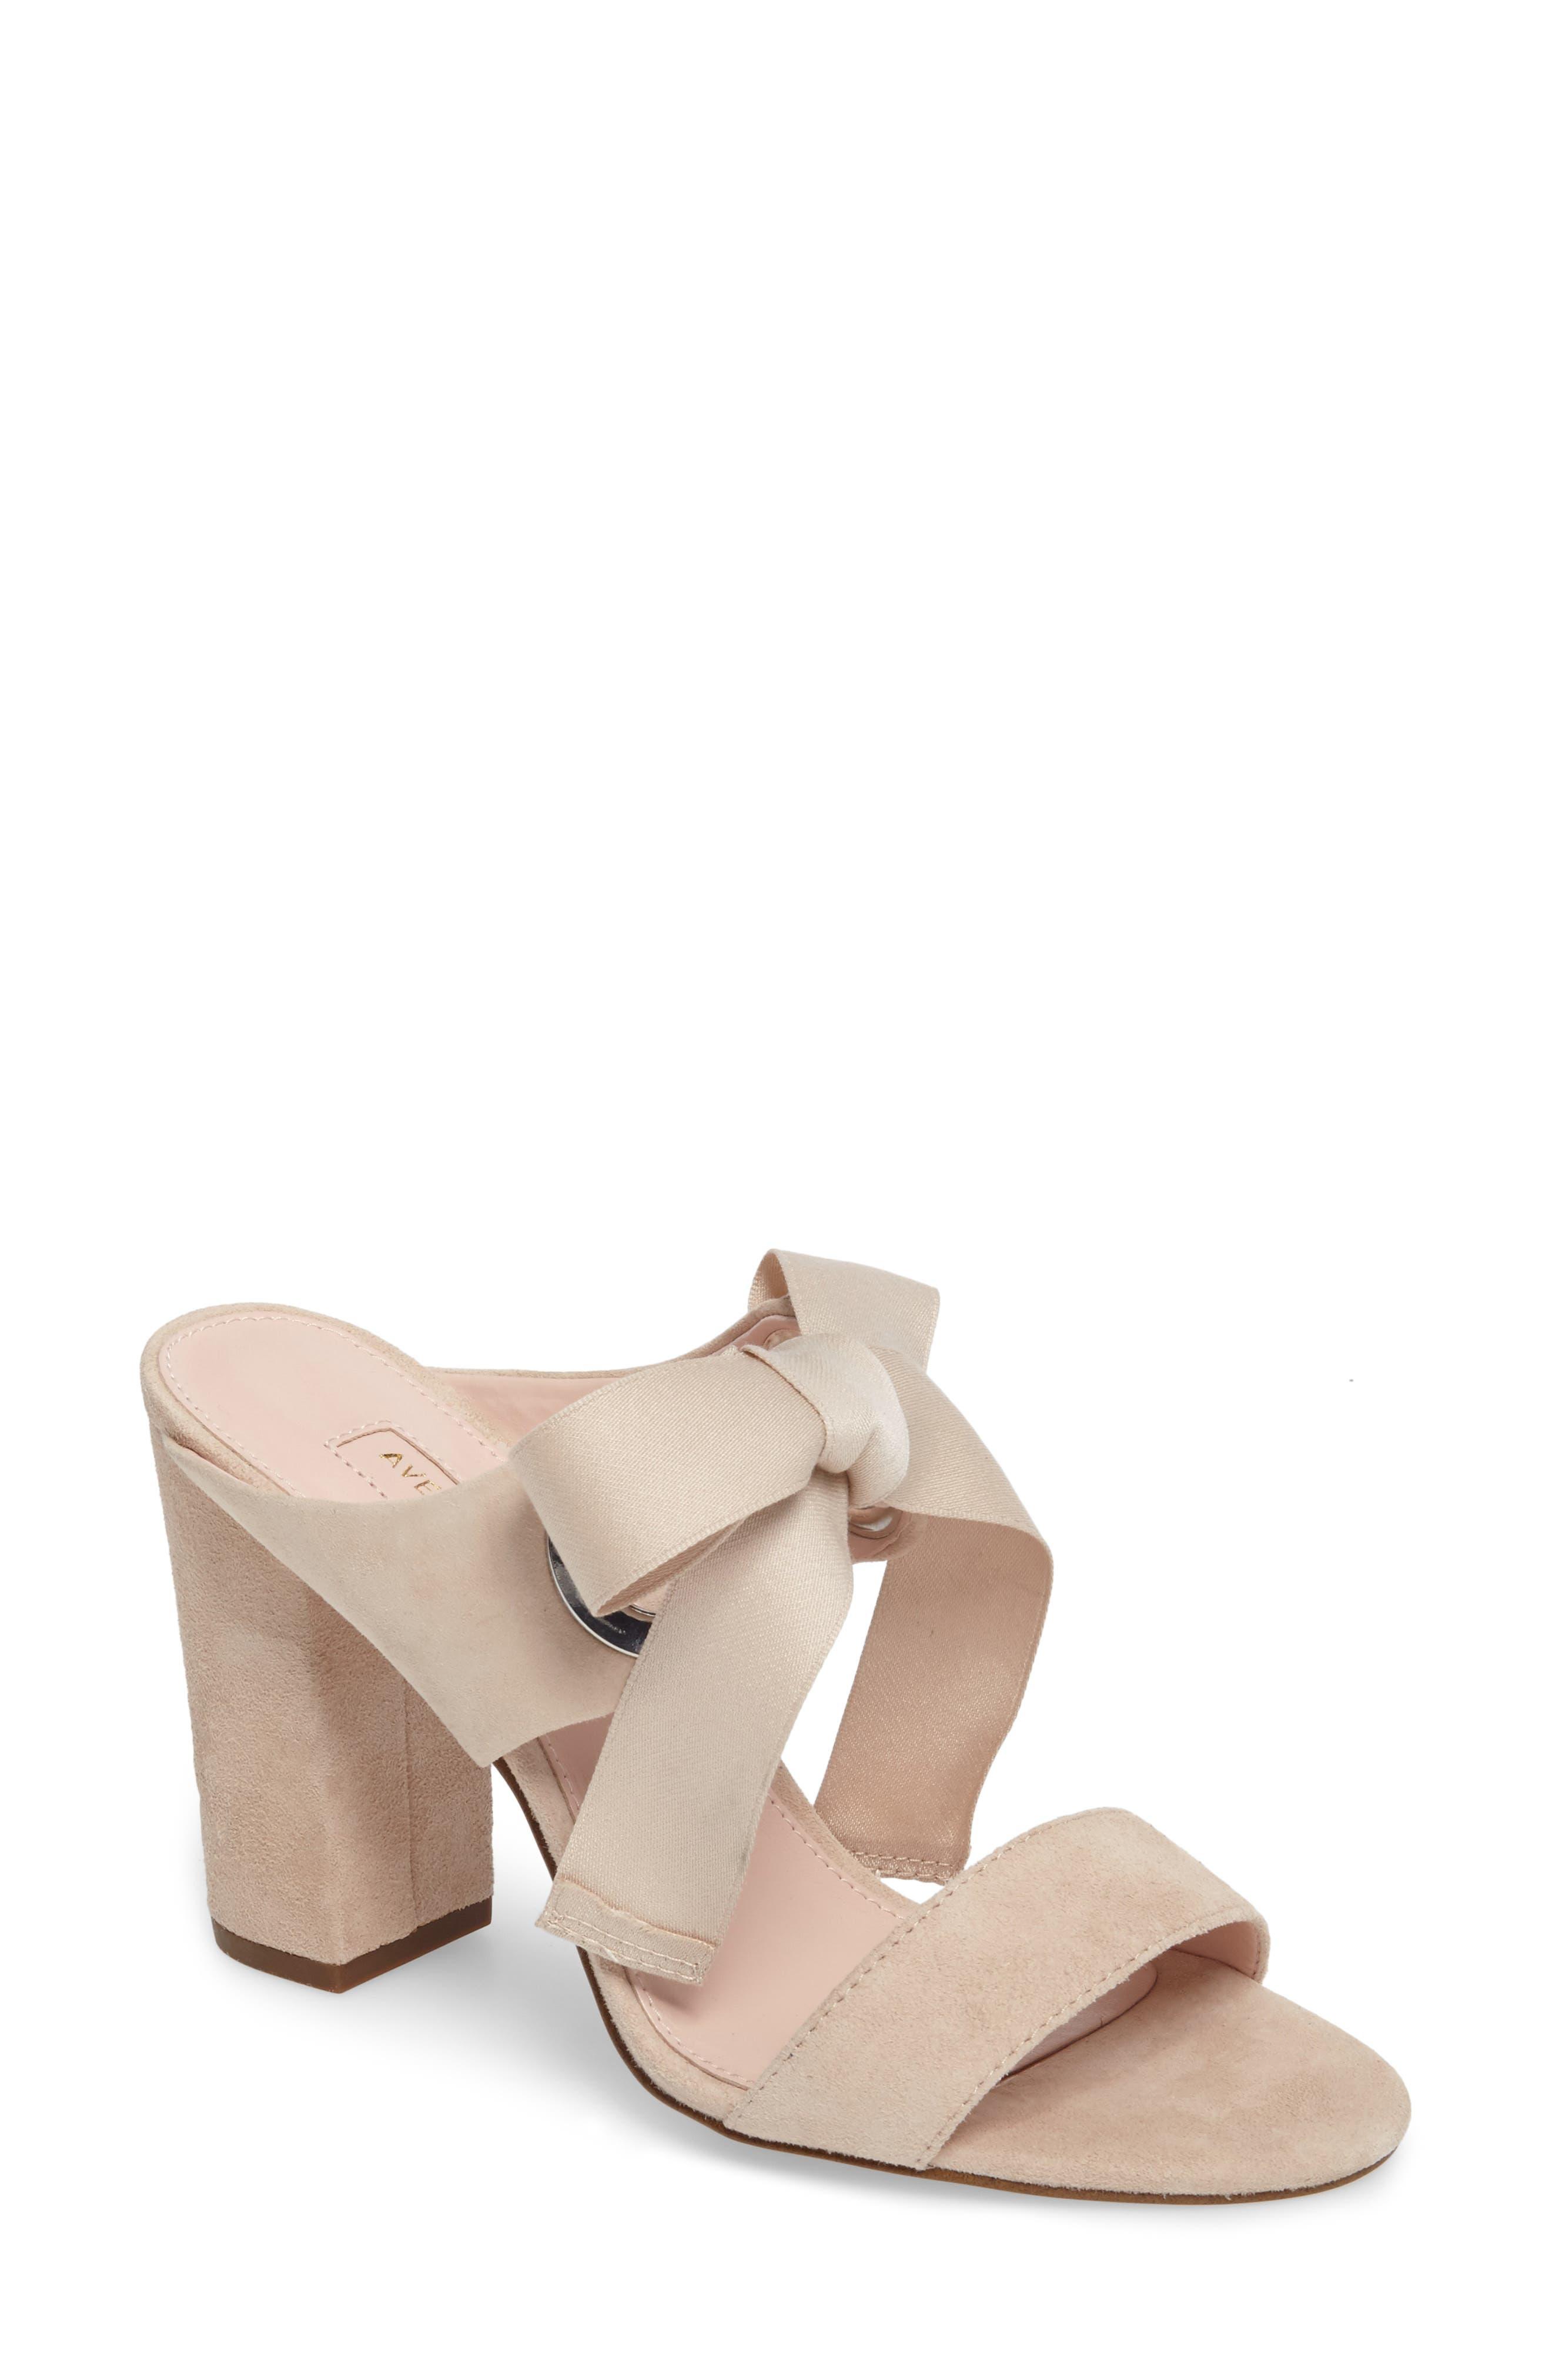 Alternate Image 1 Selected - Avec Les Filles Megan Tie Strap Sandal (Women)